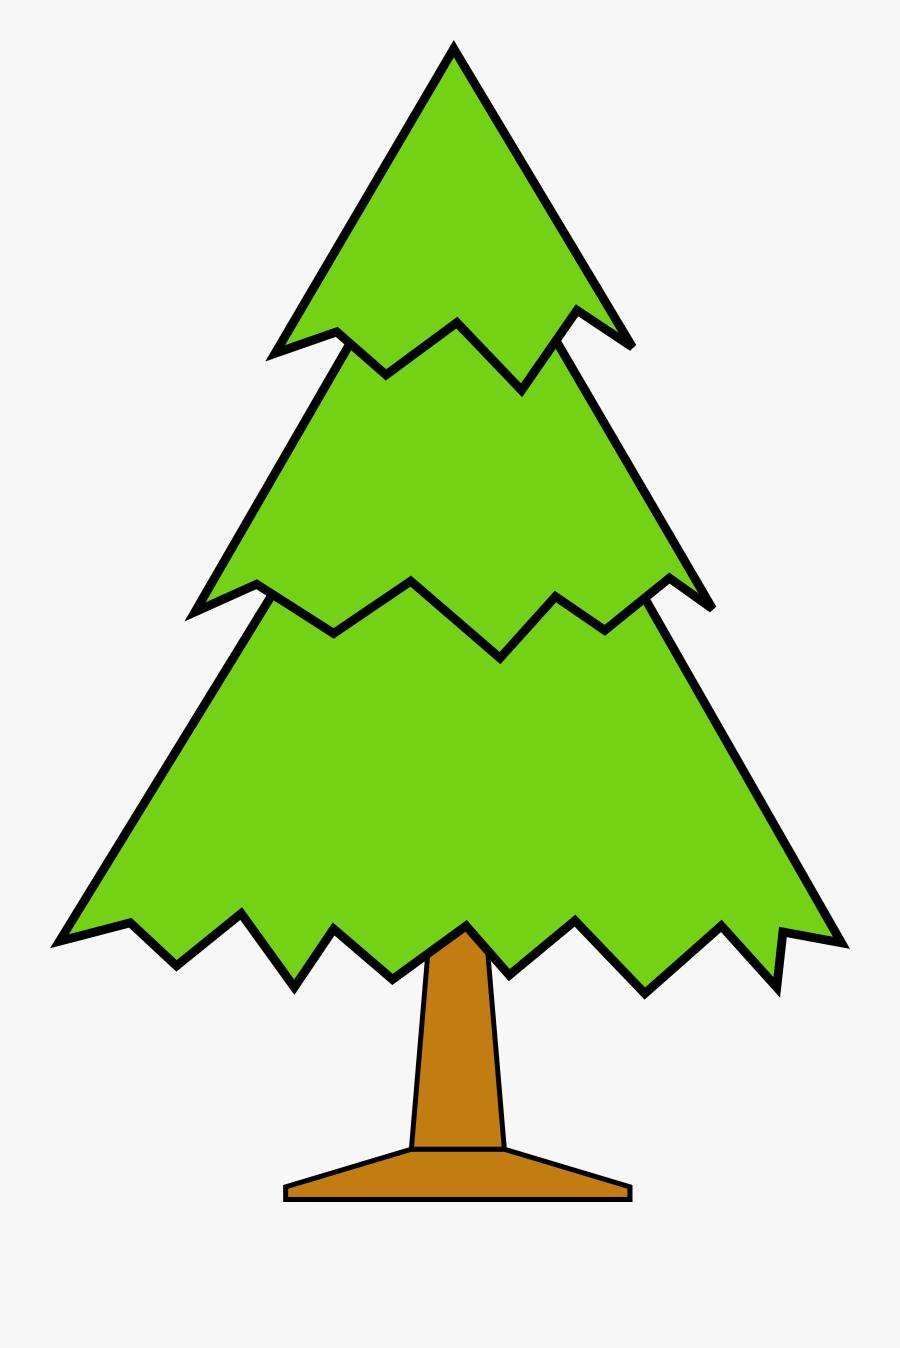 Christmas Tree Clip Art - Green Christmas Tree Clipart, Transparent Clipart